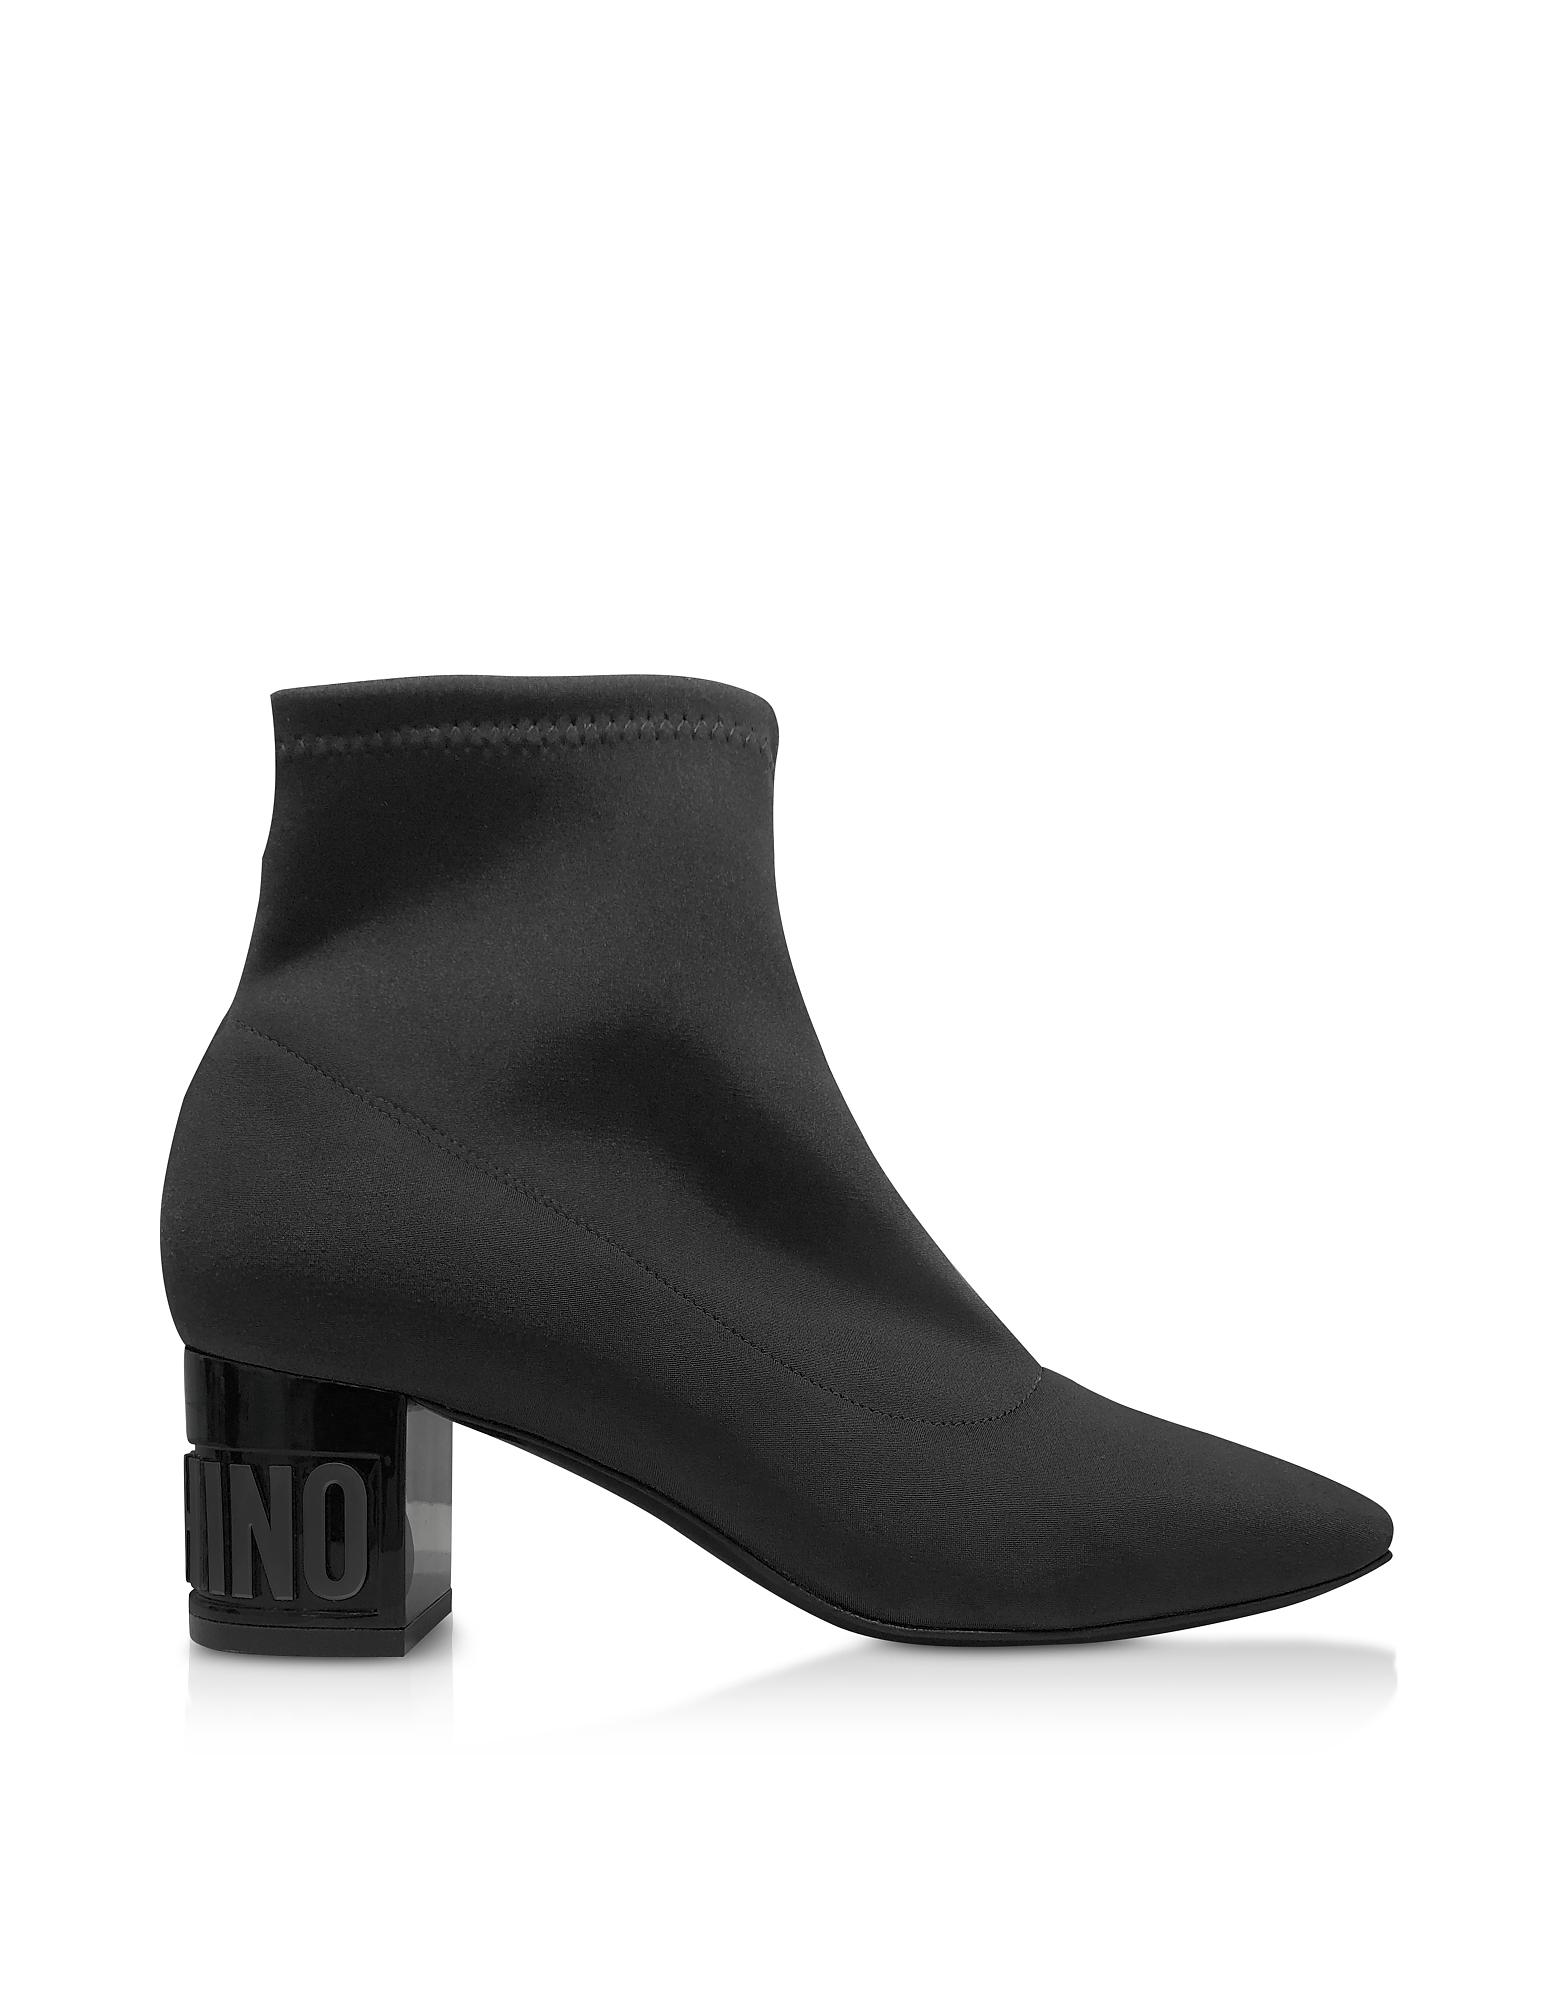 Black Neoprene Ankle Boots w/Signature Heel